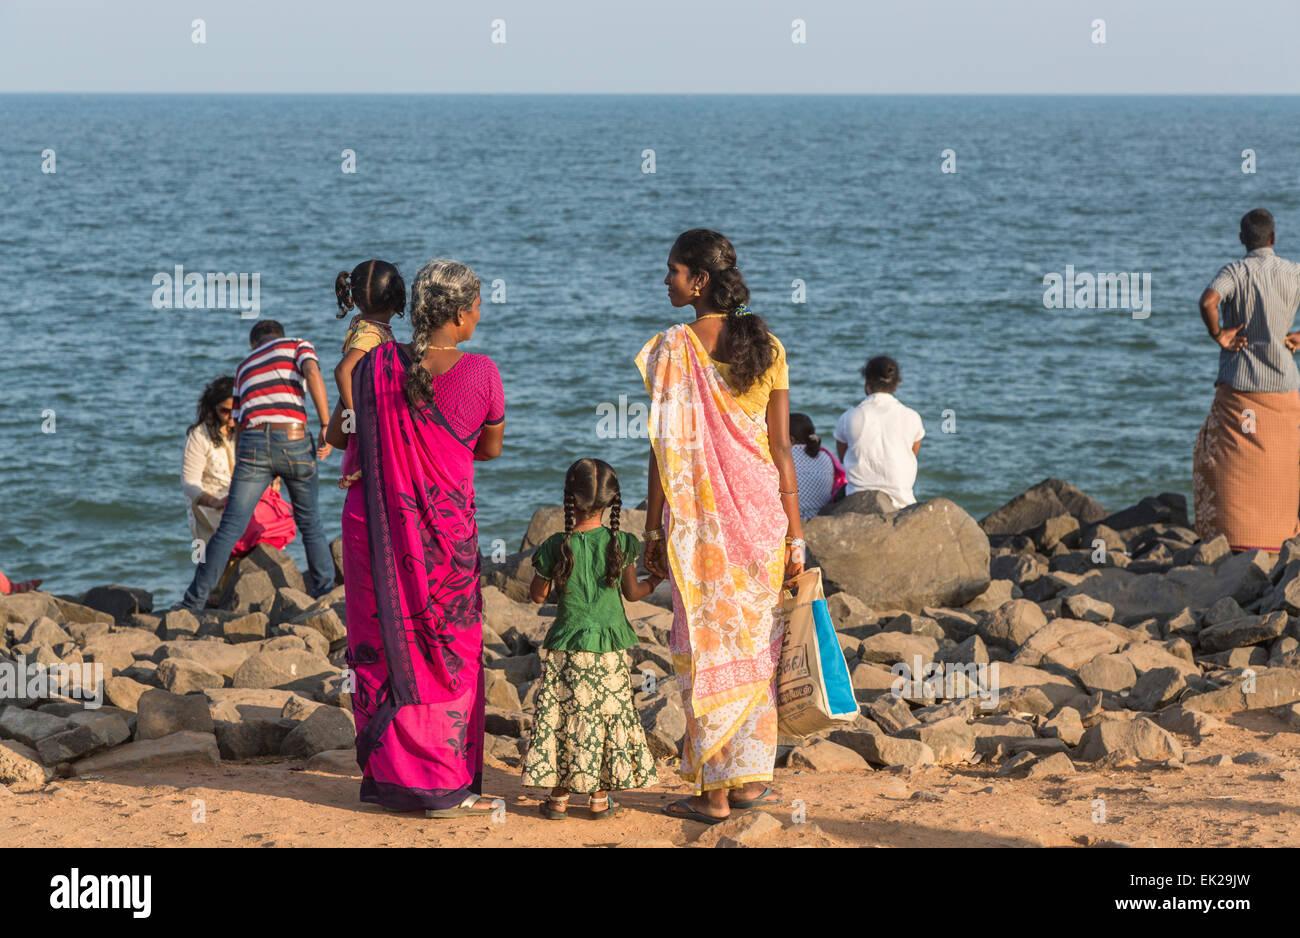 Local Indiana família na praia em Pondicherry ou Puducherry, Tamil Nadu, na Índia meridional Imagens de Stock